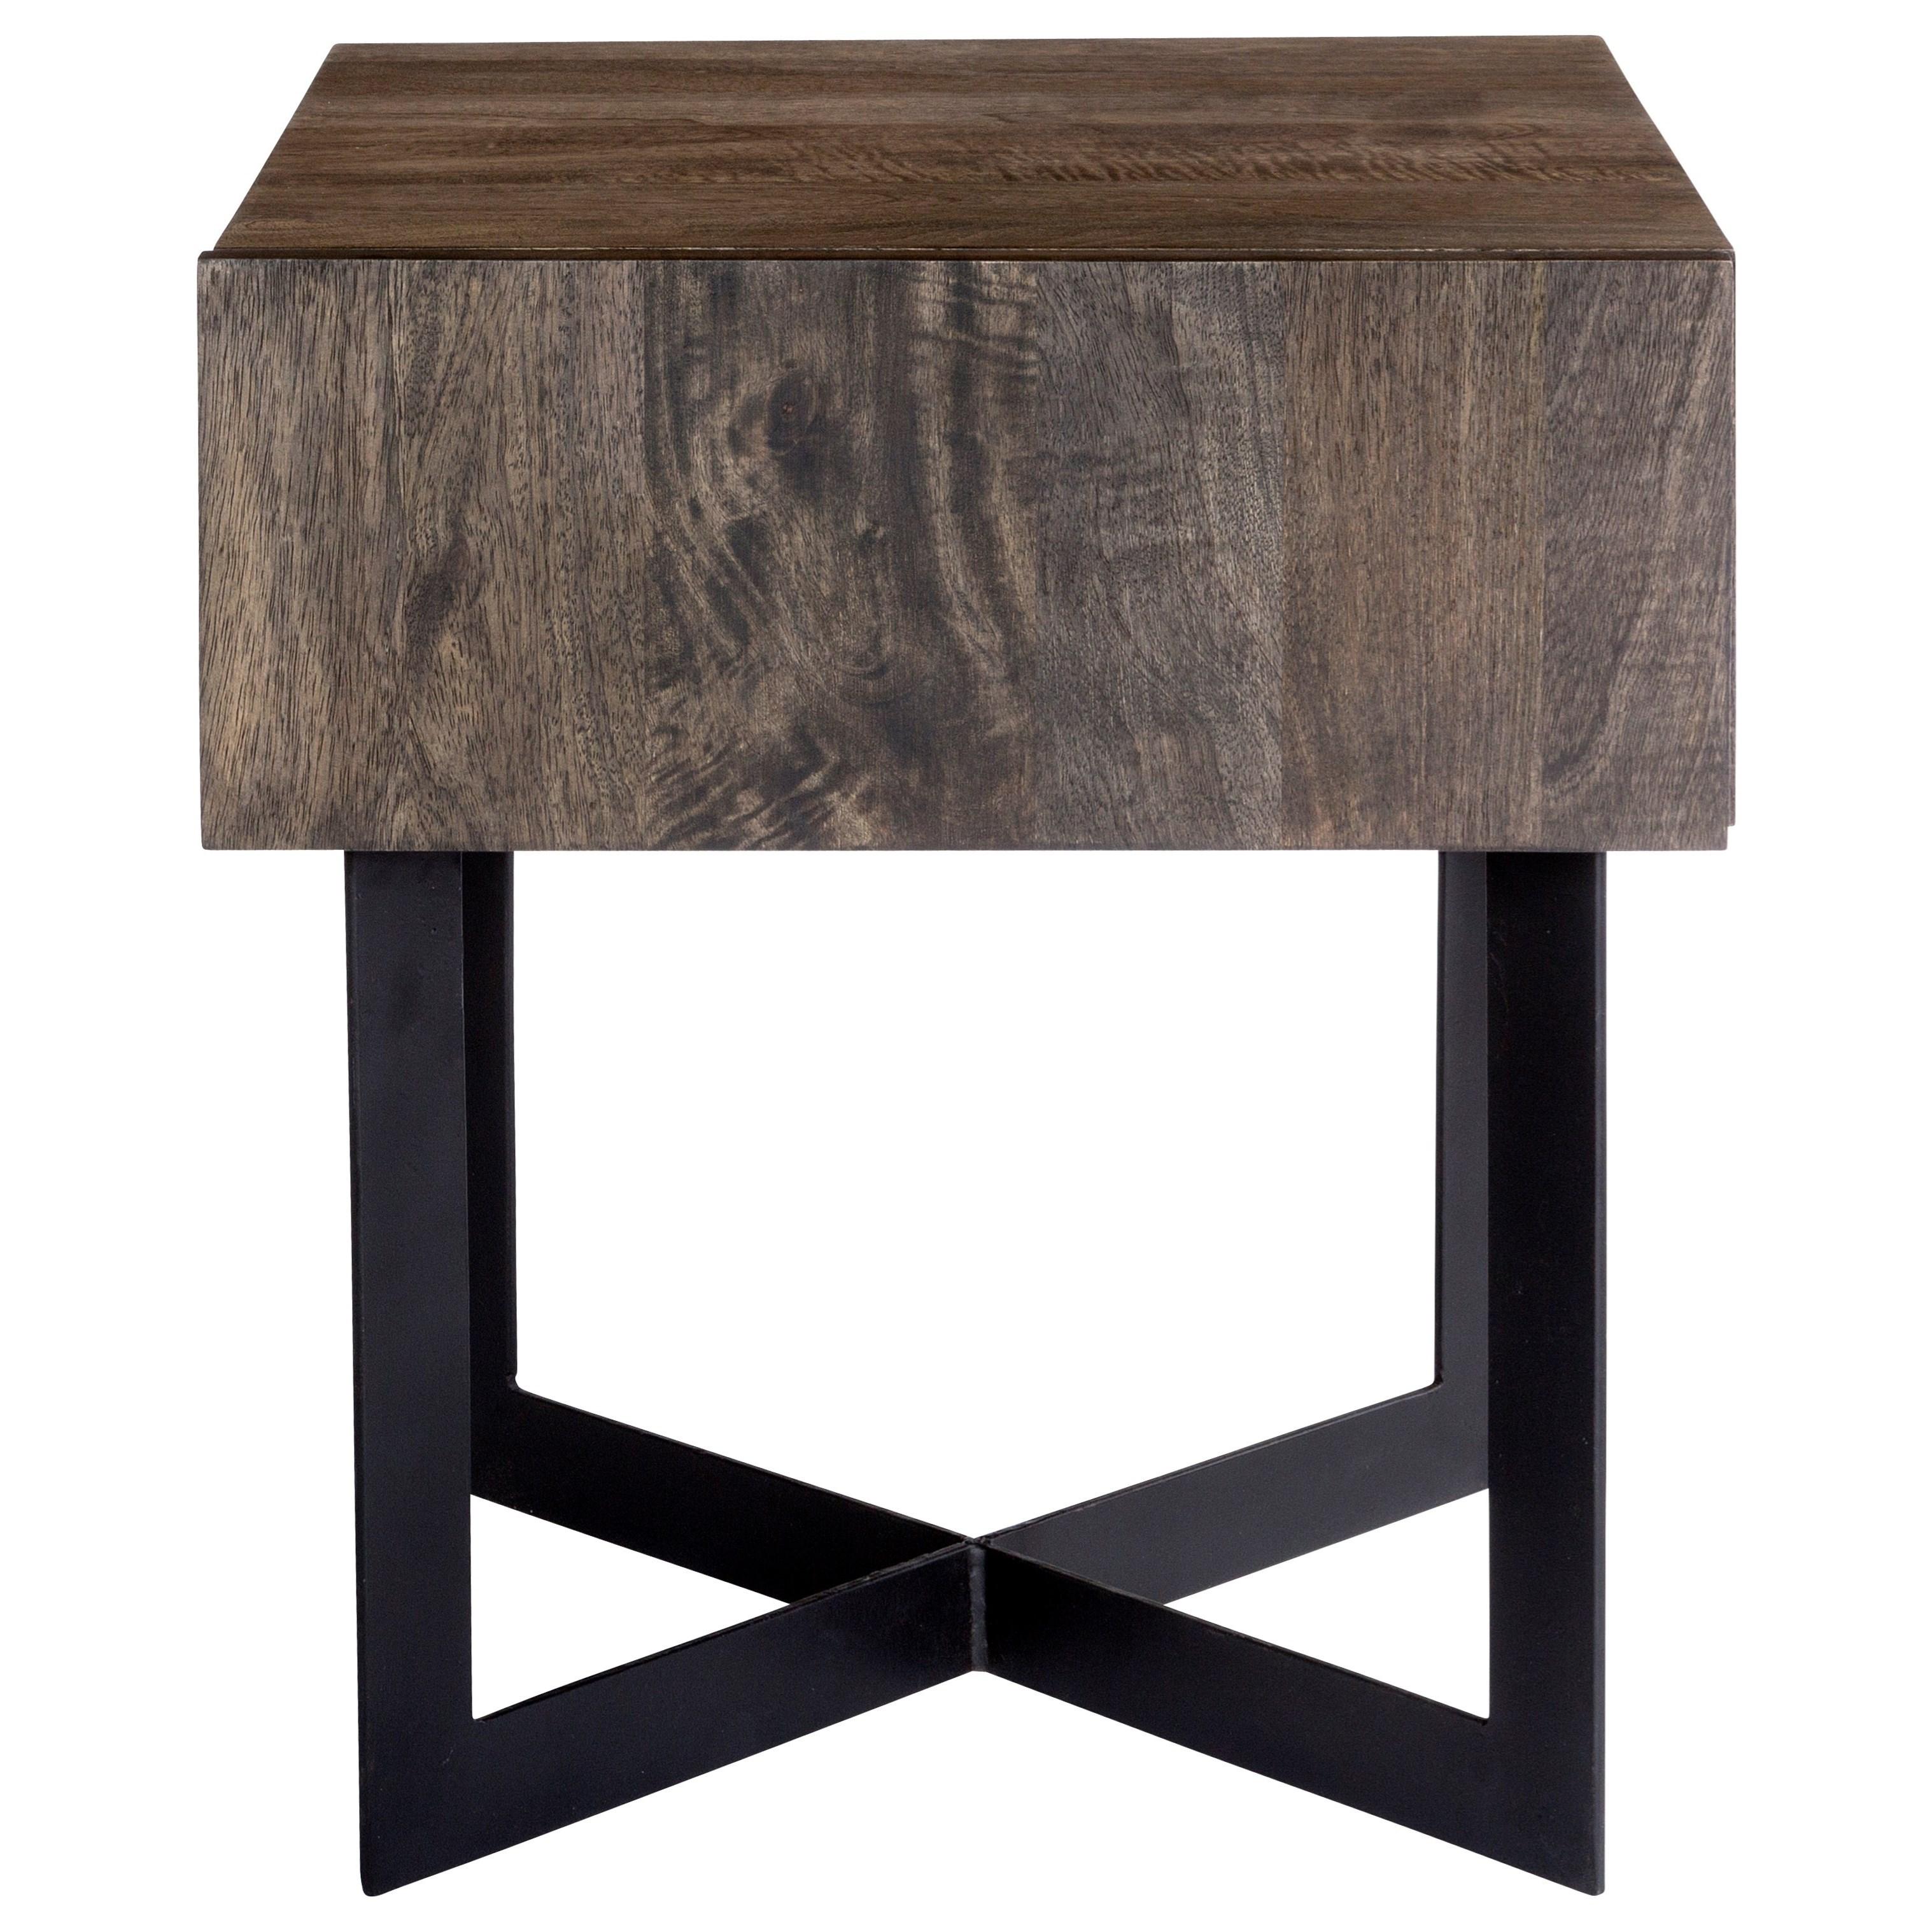 Tiburon Side Table at Sadler's Home Furnishings